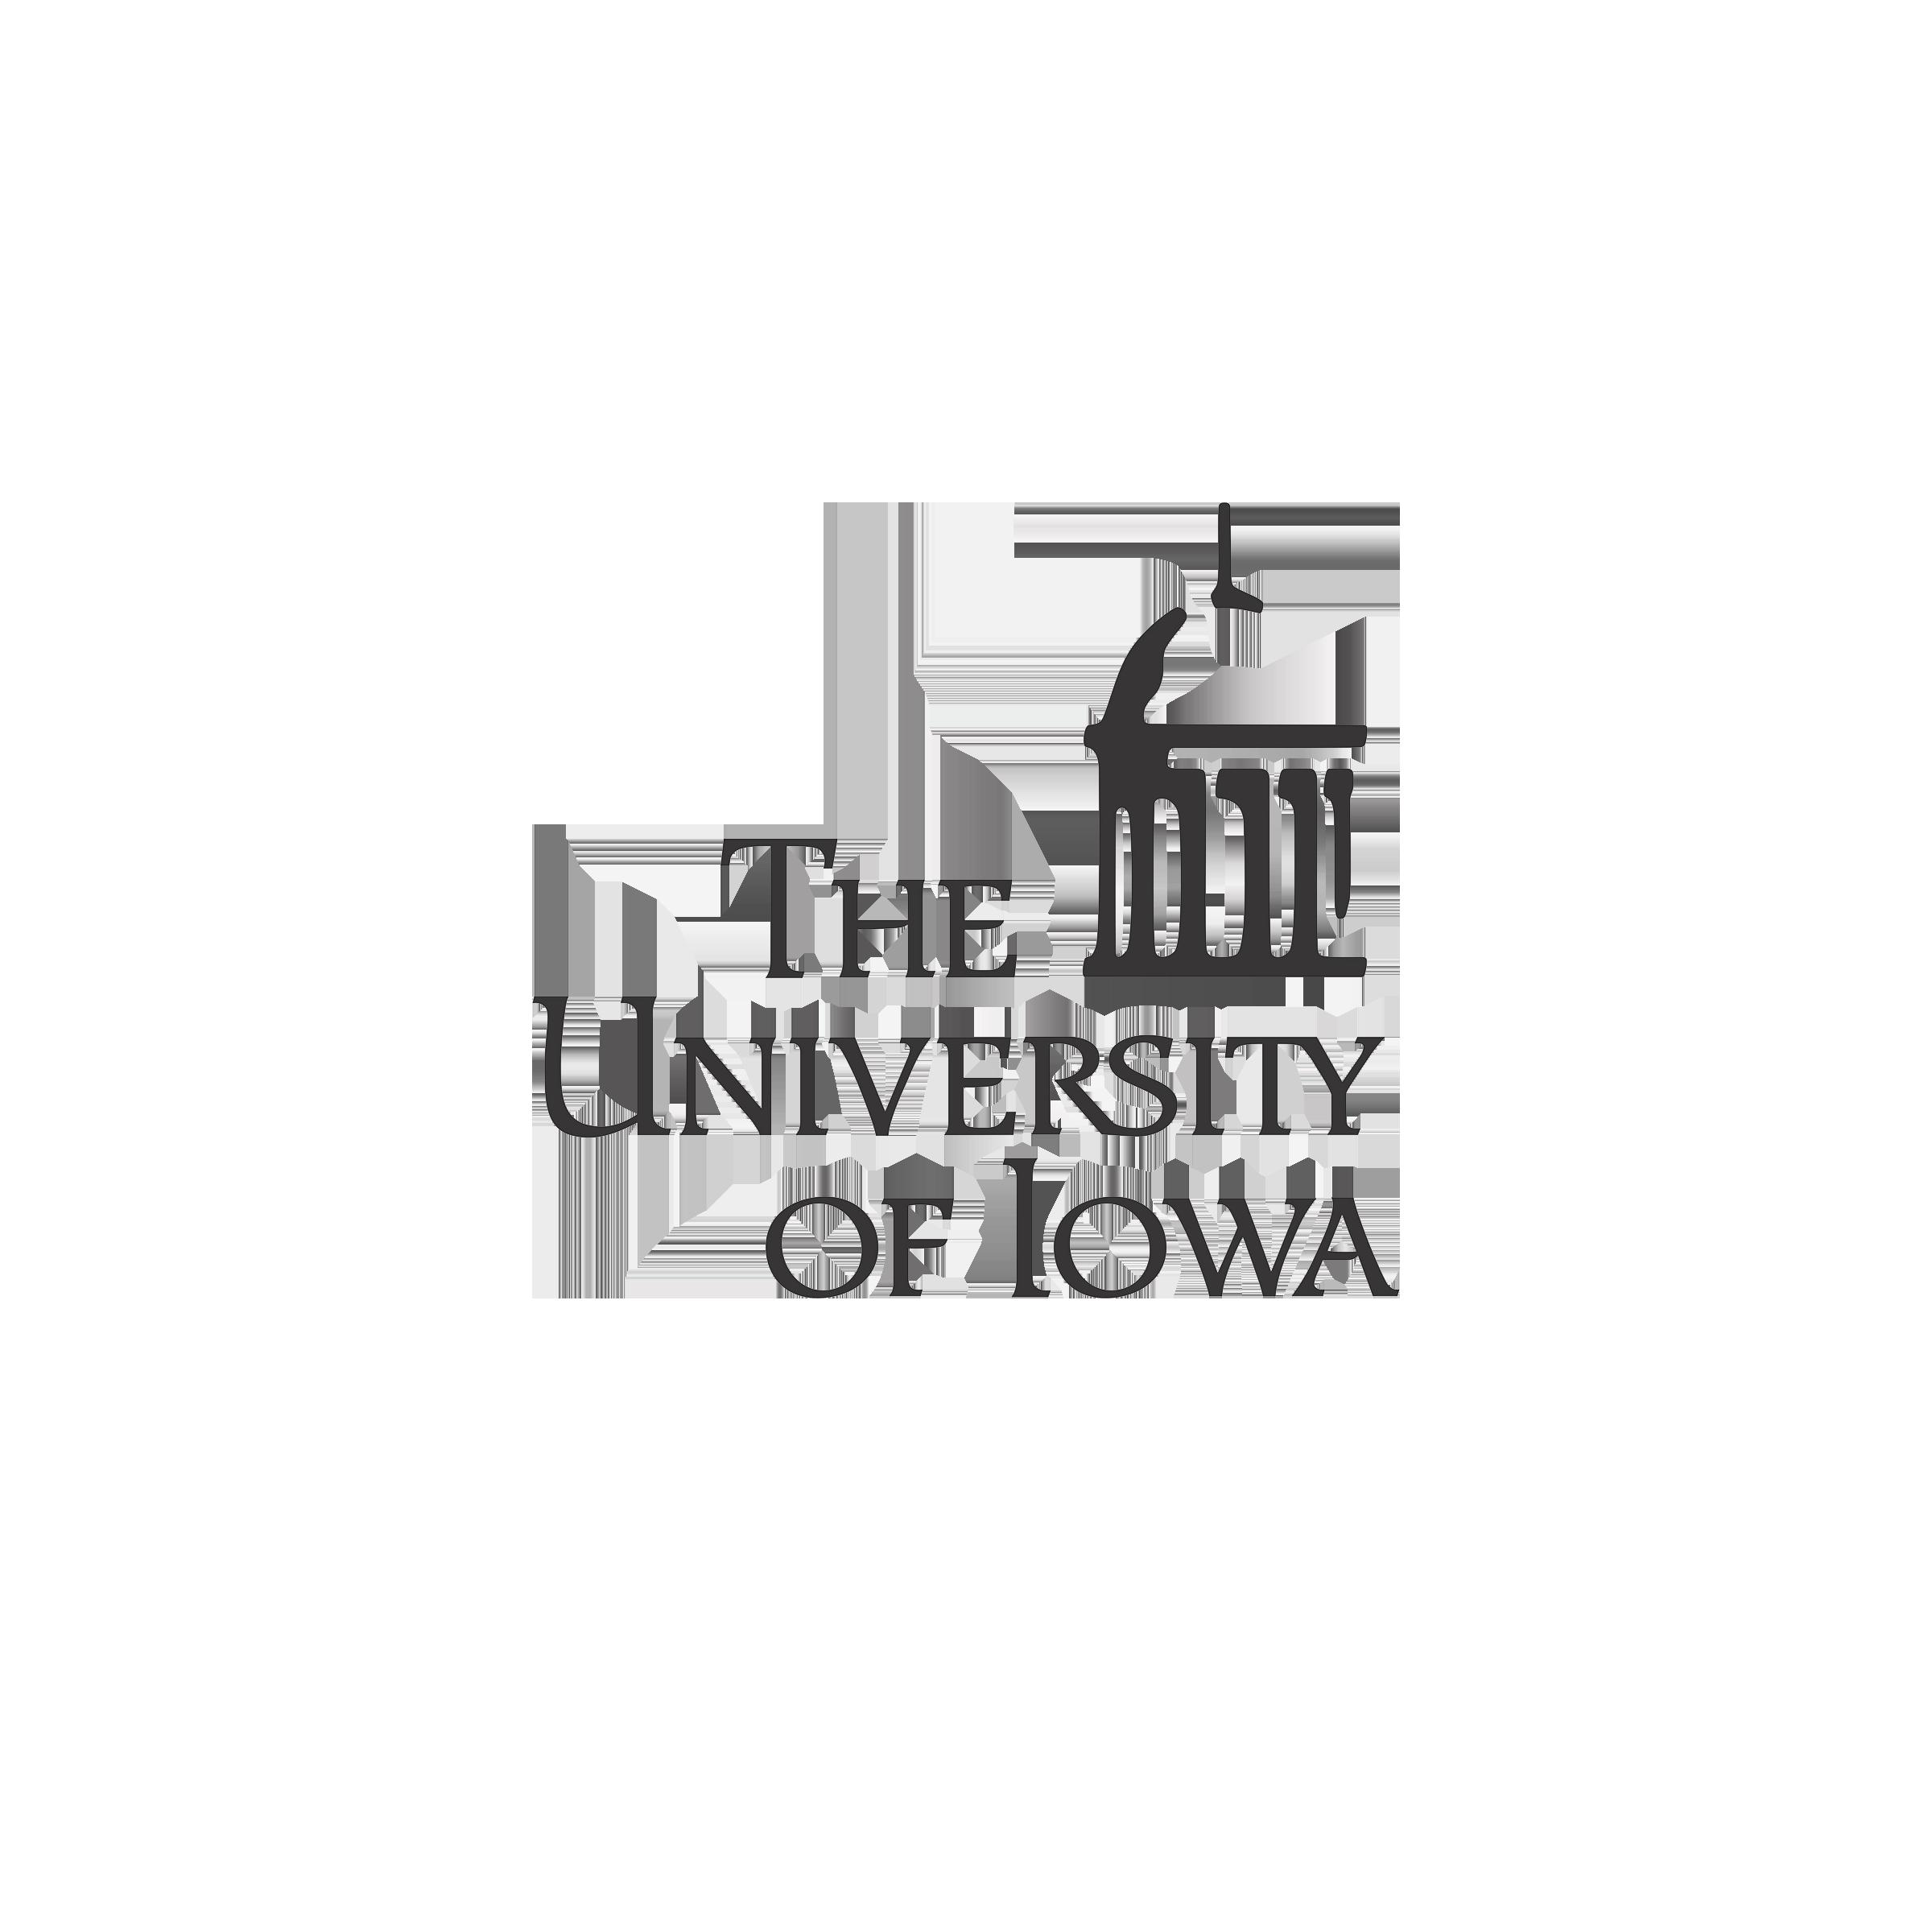 University of Iowa.png